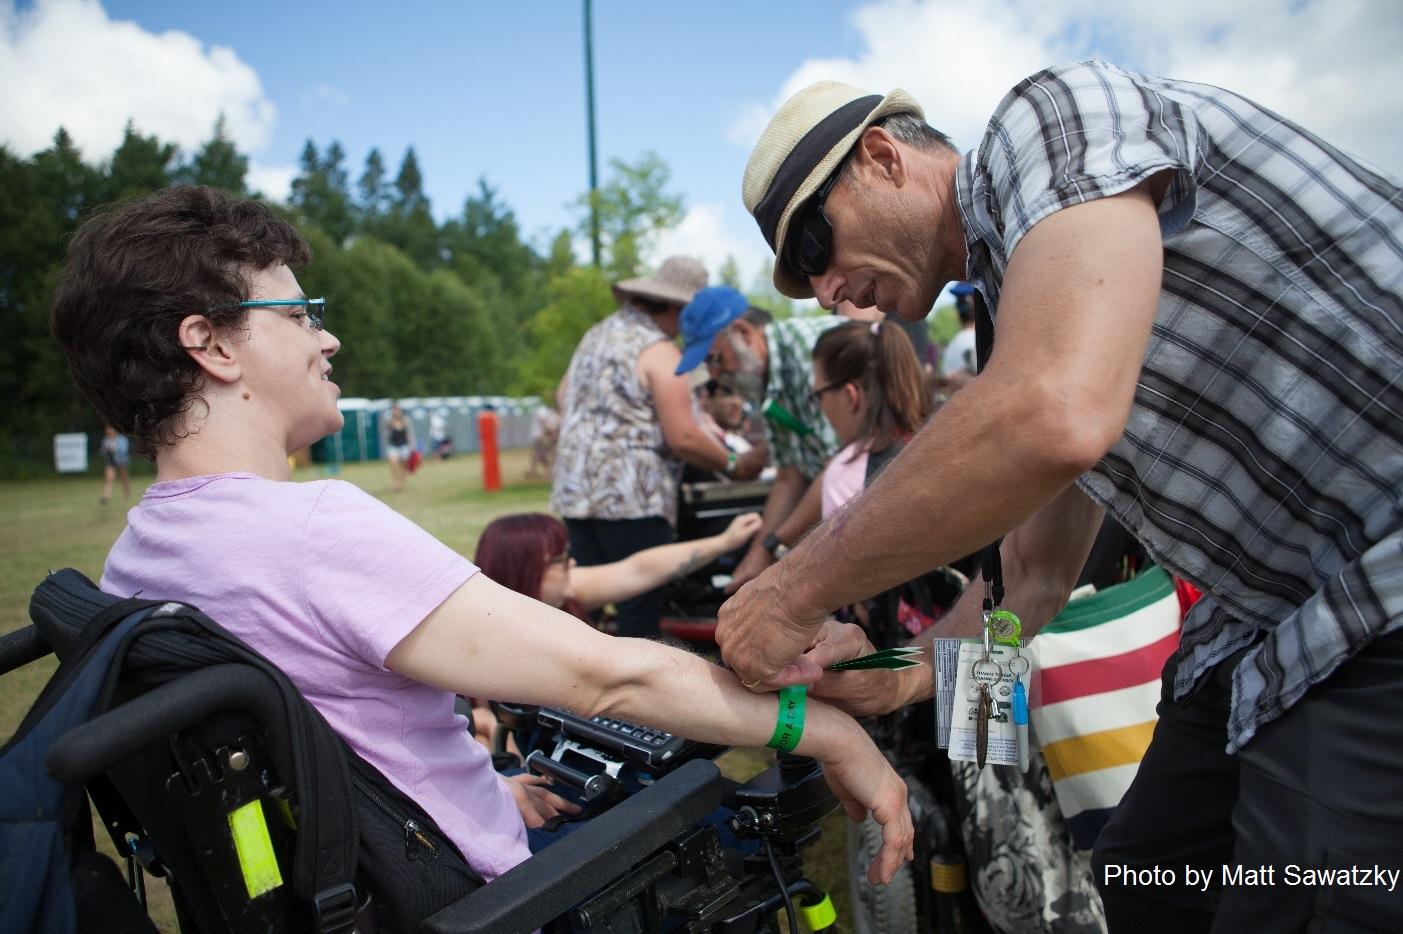 Woman in a wheelchair being assisted with her wristband by a Winnipeg Folk Festival volunteer. Photo by Matt Sawatzky.